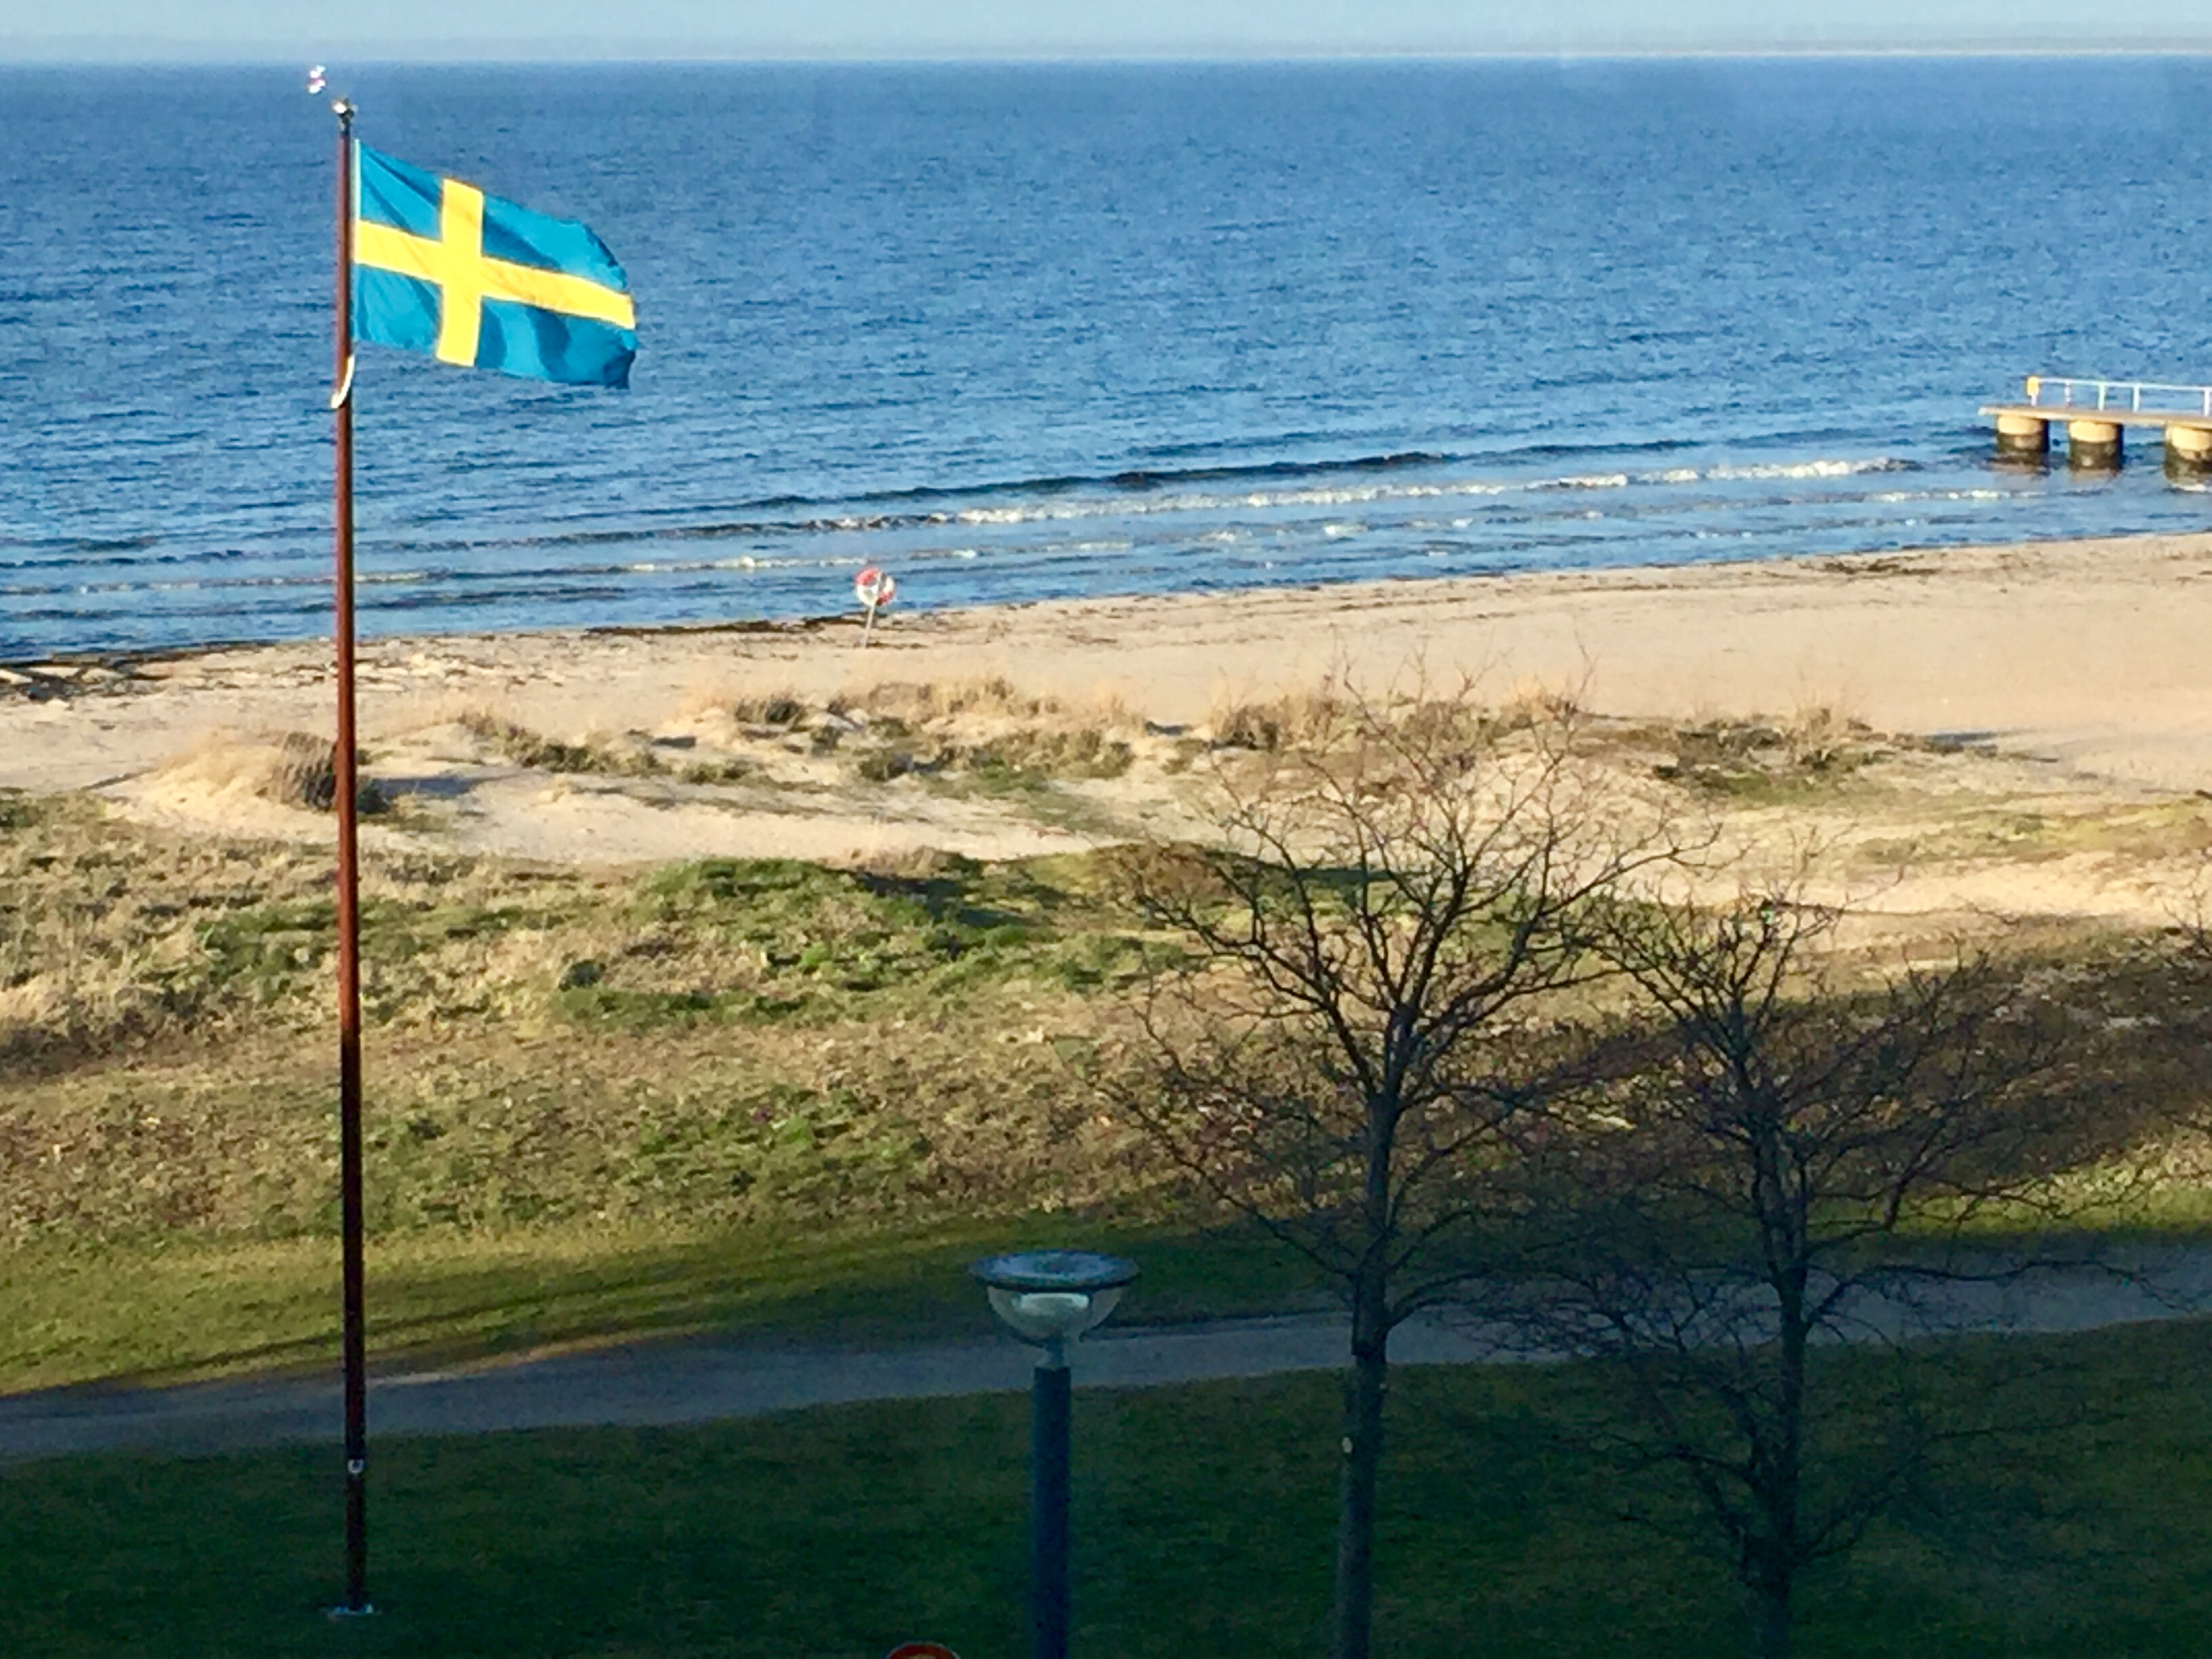 Swedish flag flying over coast of North Sea